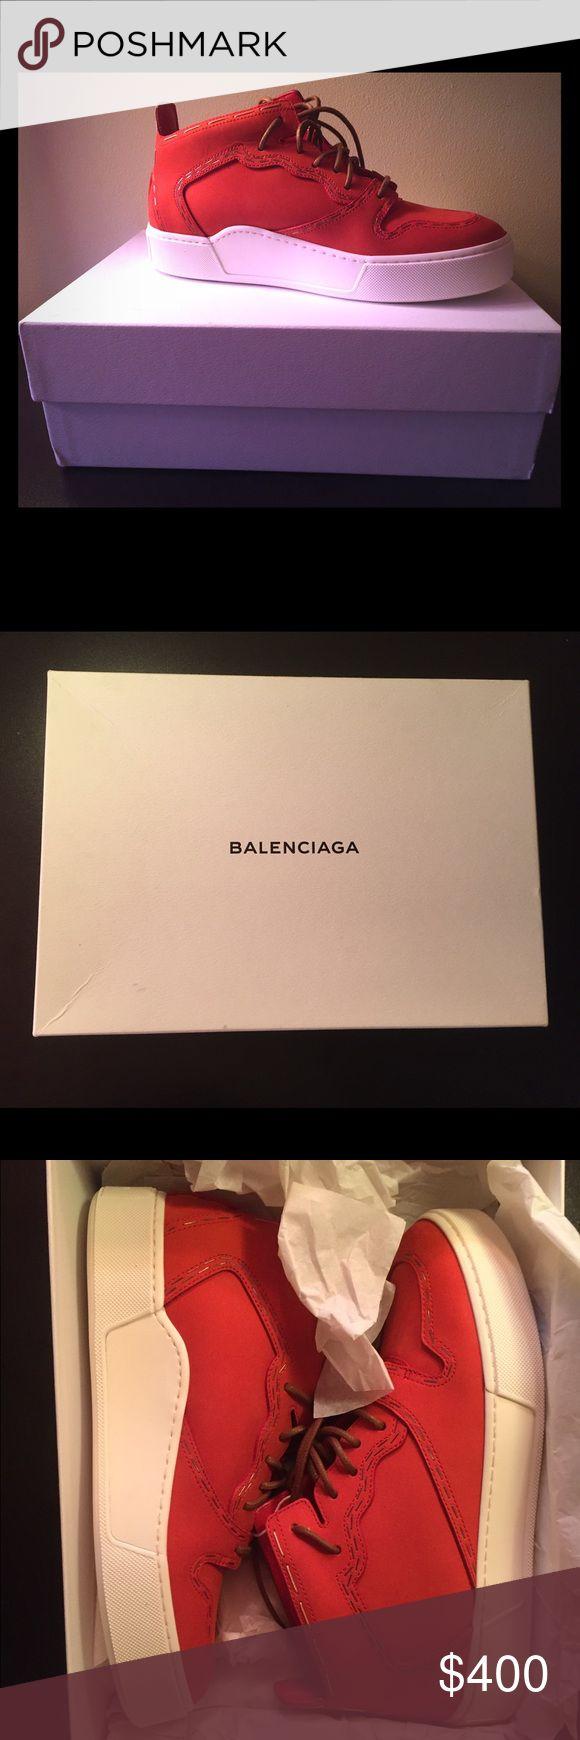 Balenciaga shoes!! Balenciaga Bright Red Sneakers. Never worn (too big for me) with original packaging, including care bag. Balenciaga Shoes Sneakers